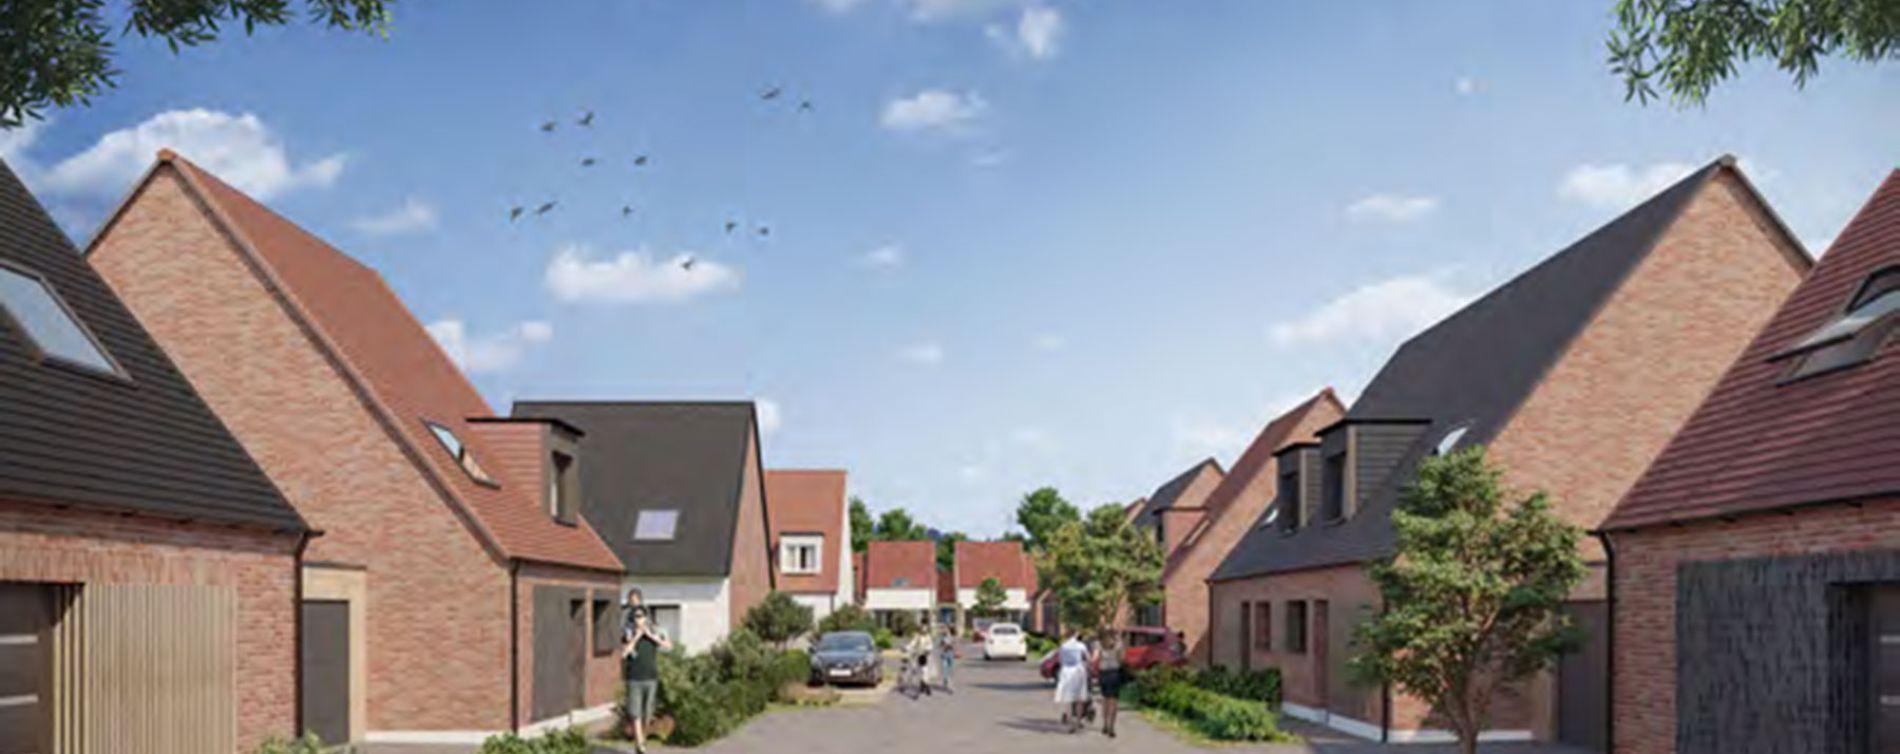 Sainghin-en-Weppes : programme immobilier neuve « Naturessence » (3)